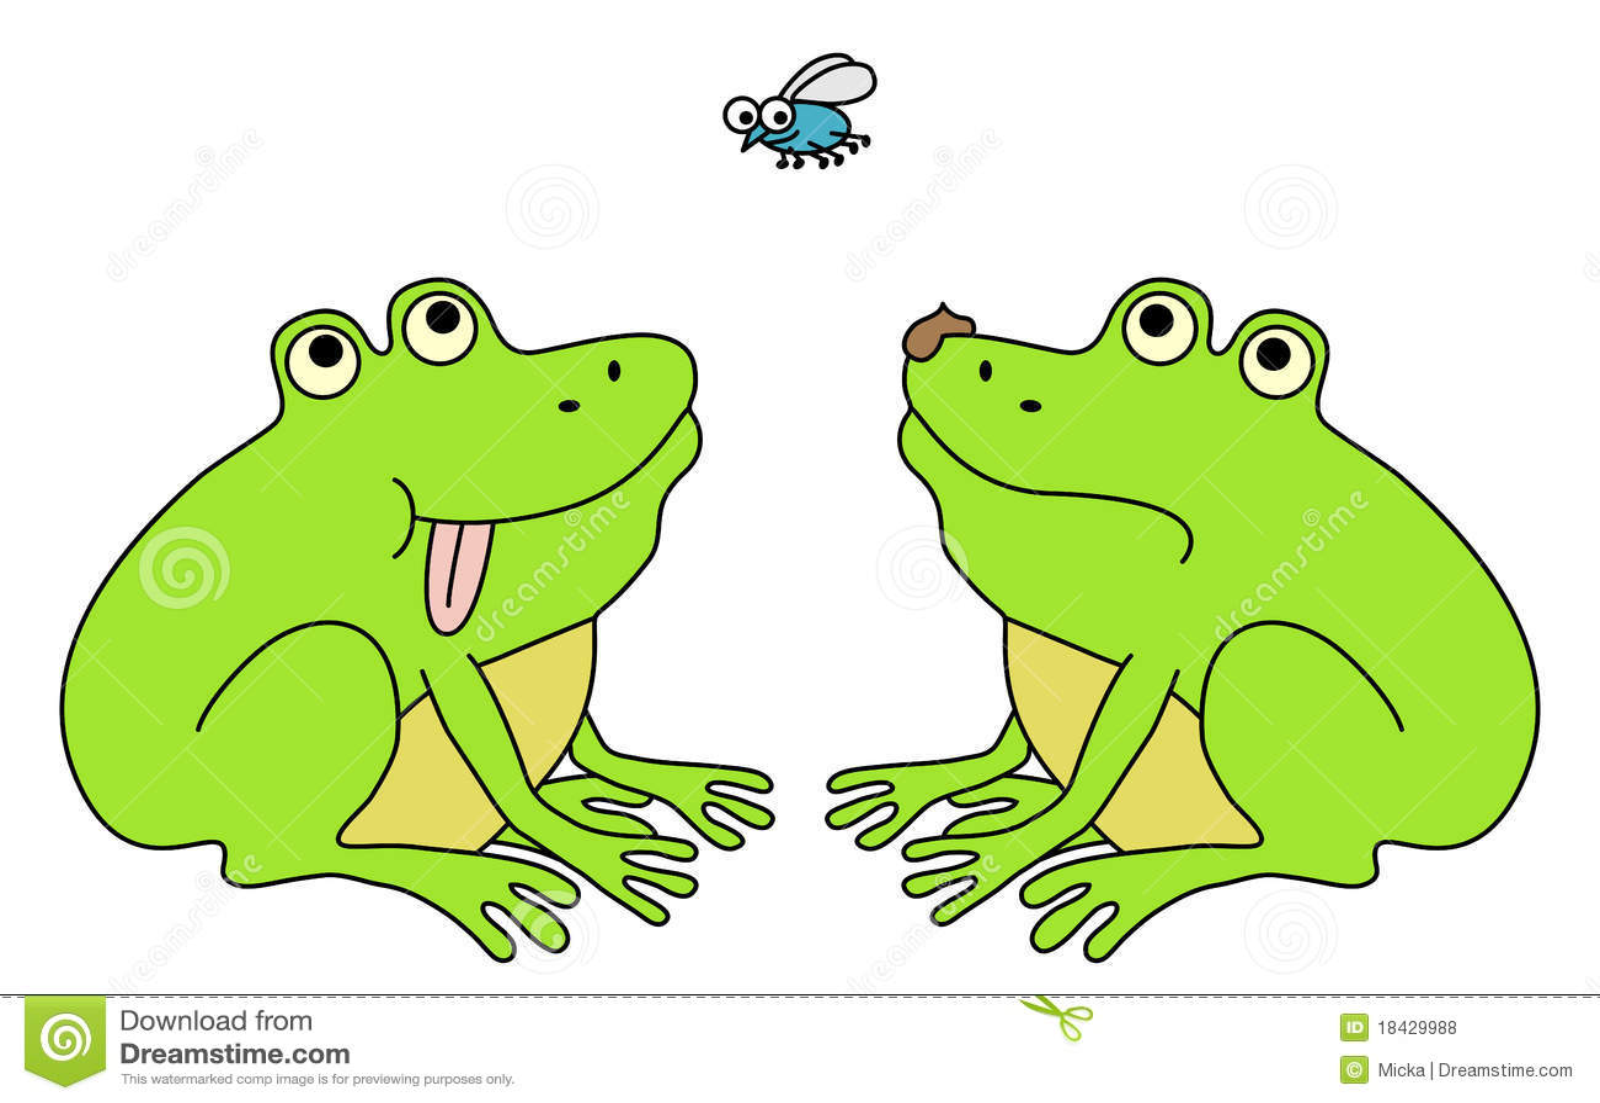 happy and sad frog royalty free stock photos image 18429988